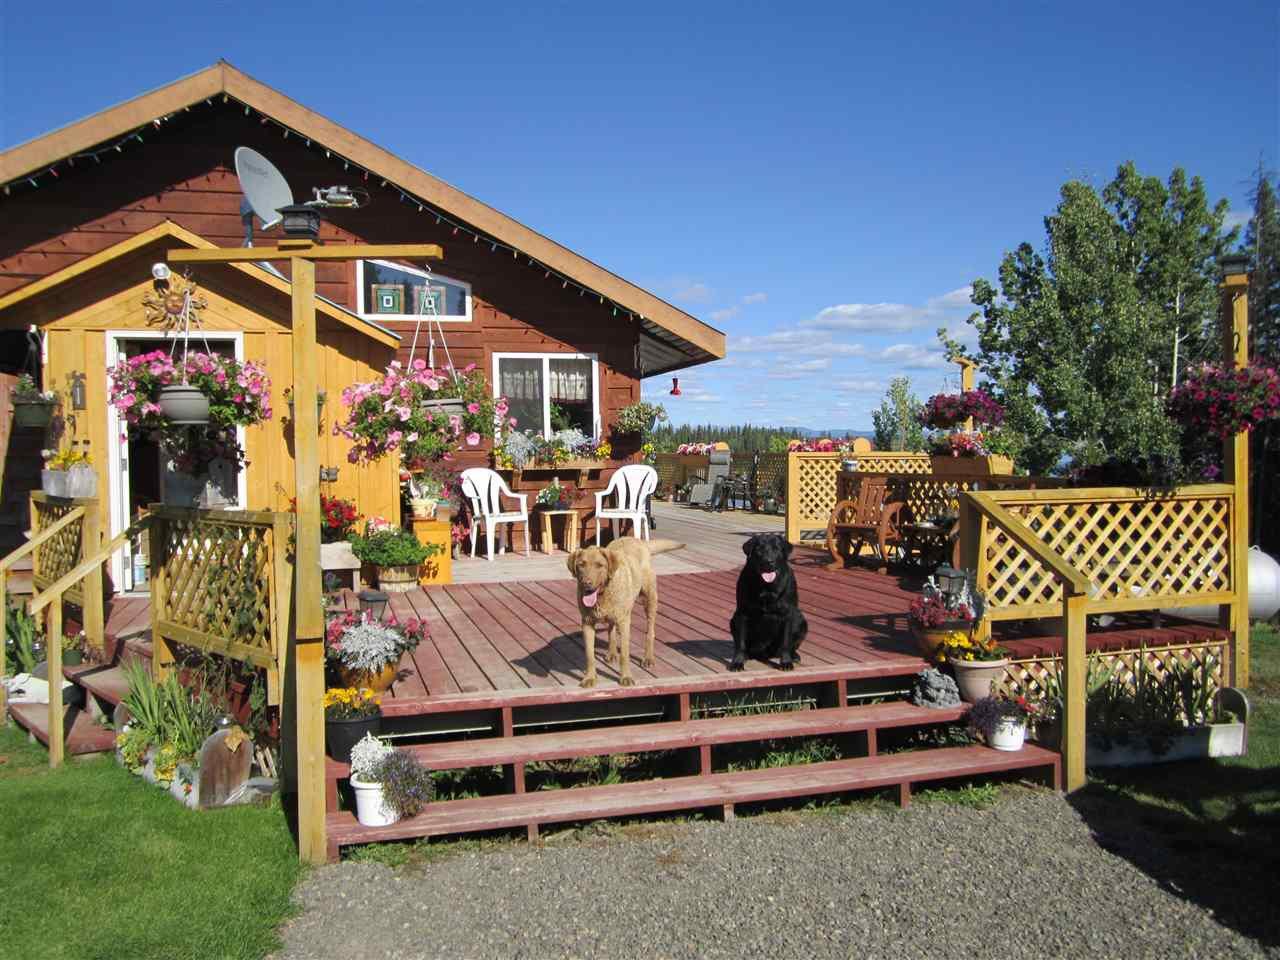 Photo 14: Photos: 3126 ELSEY Road in Williams Lake: Williams Lake - Rural West House for sale (Williams Lake (Zone 27))  : MLS®# R2467730